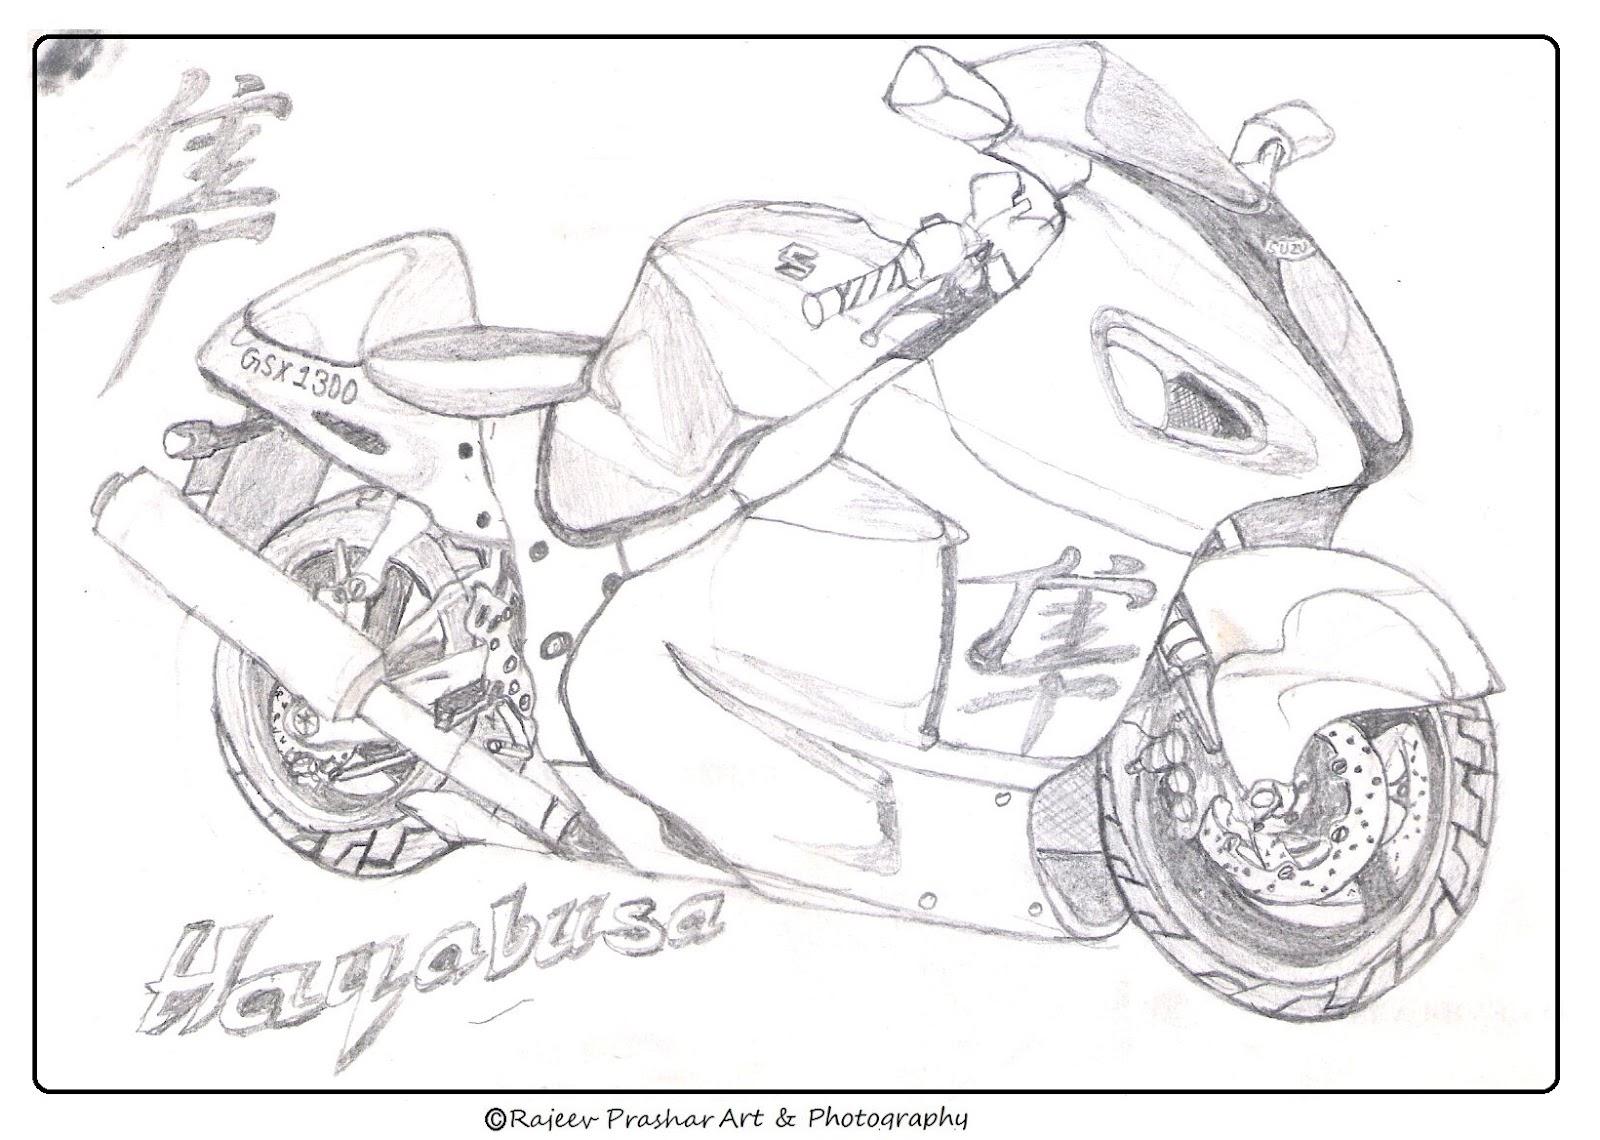 Rajeev Prashar's Art: Suzuki Hayabusa